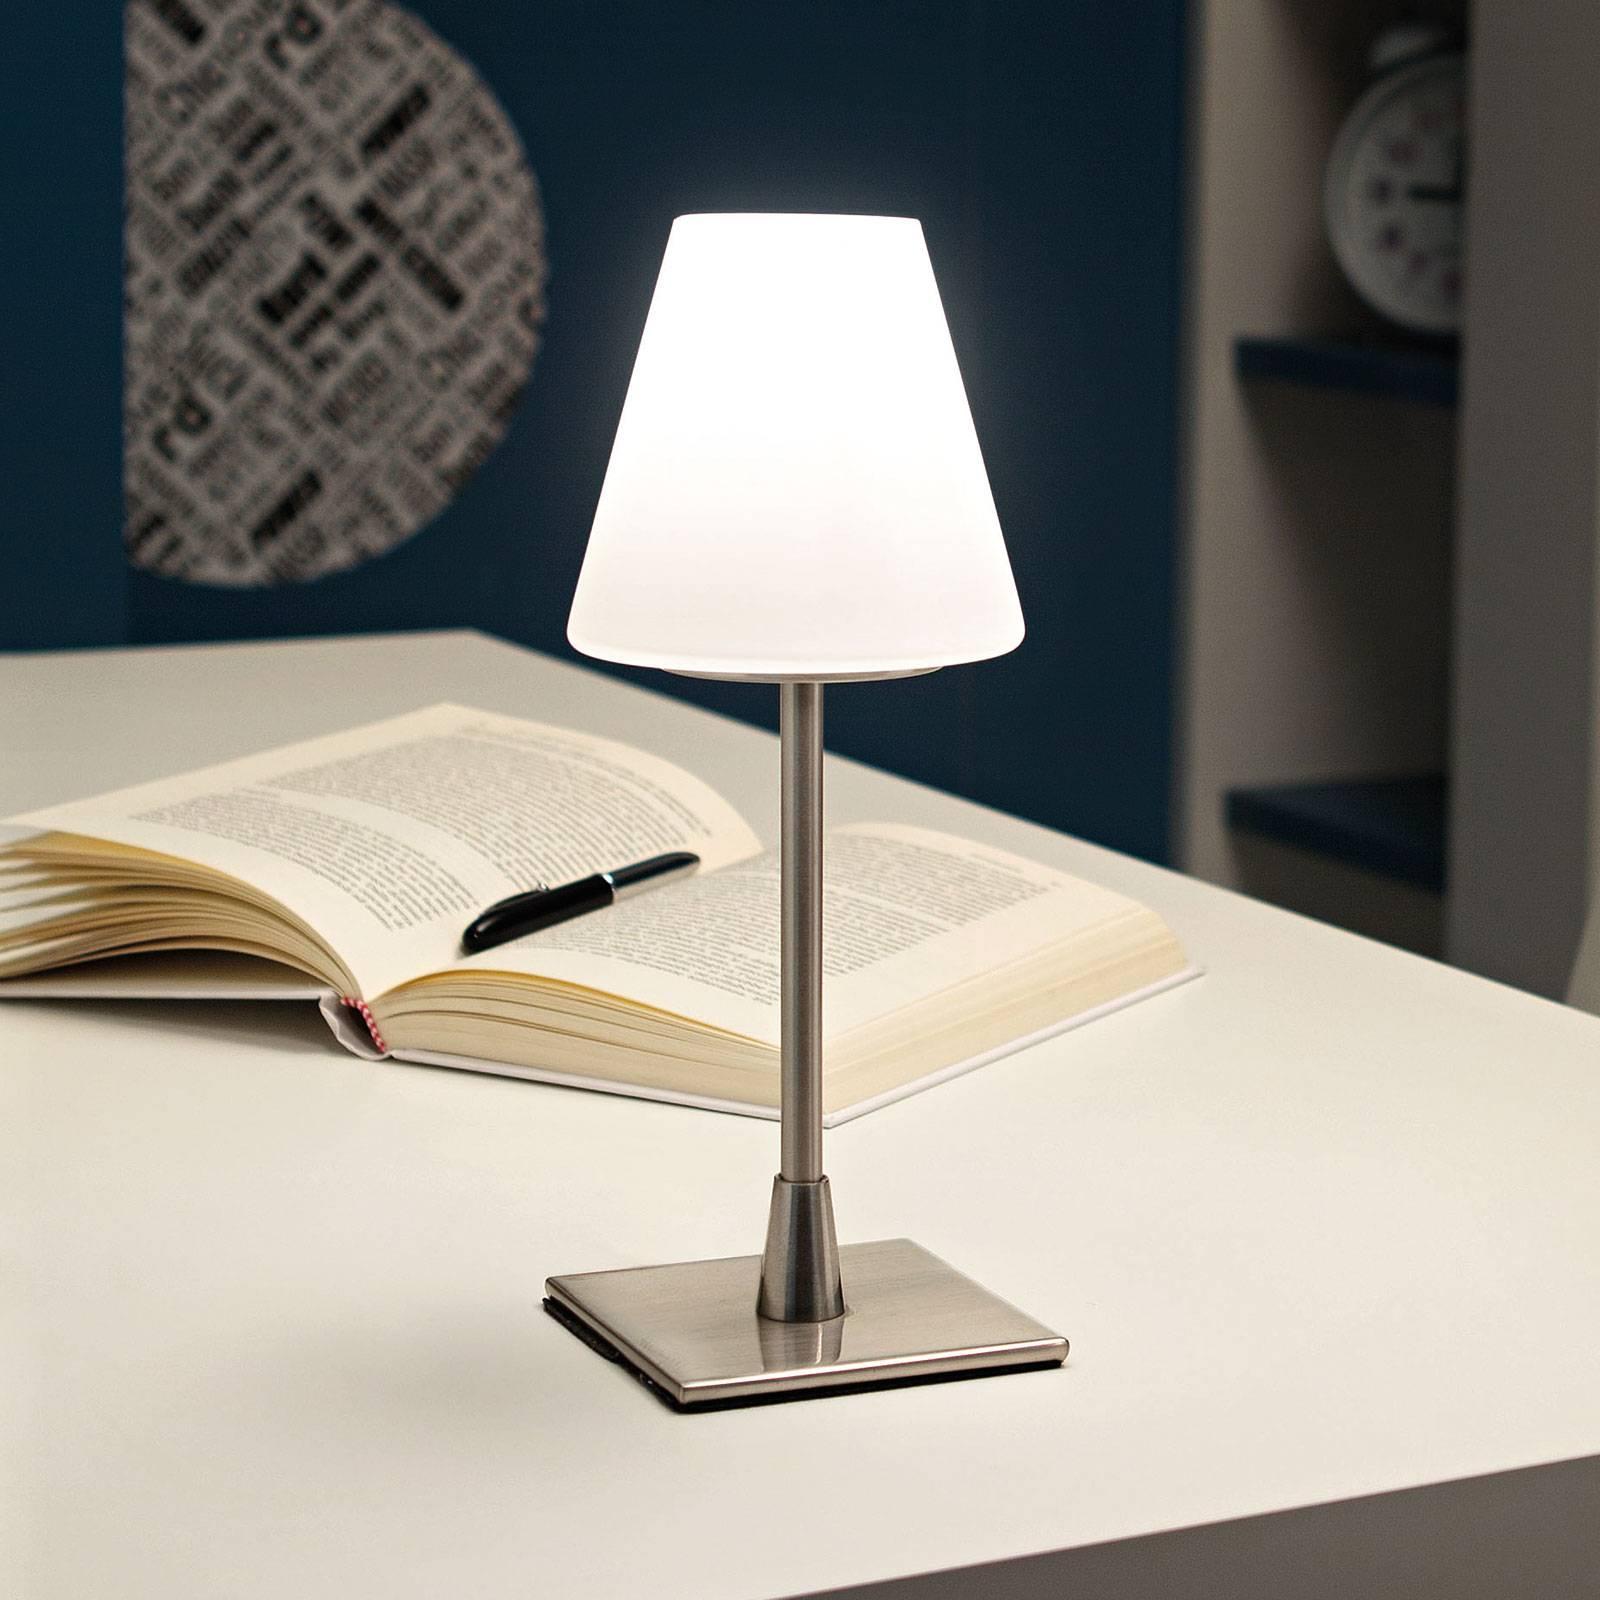 LED-pöytälamppu Lucy kosketushimmentimellä, kromi